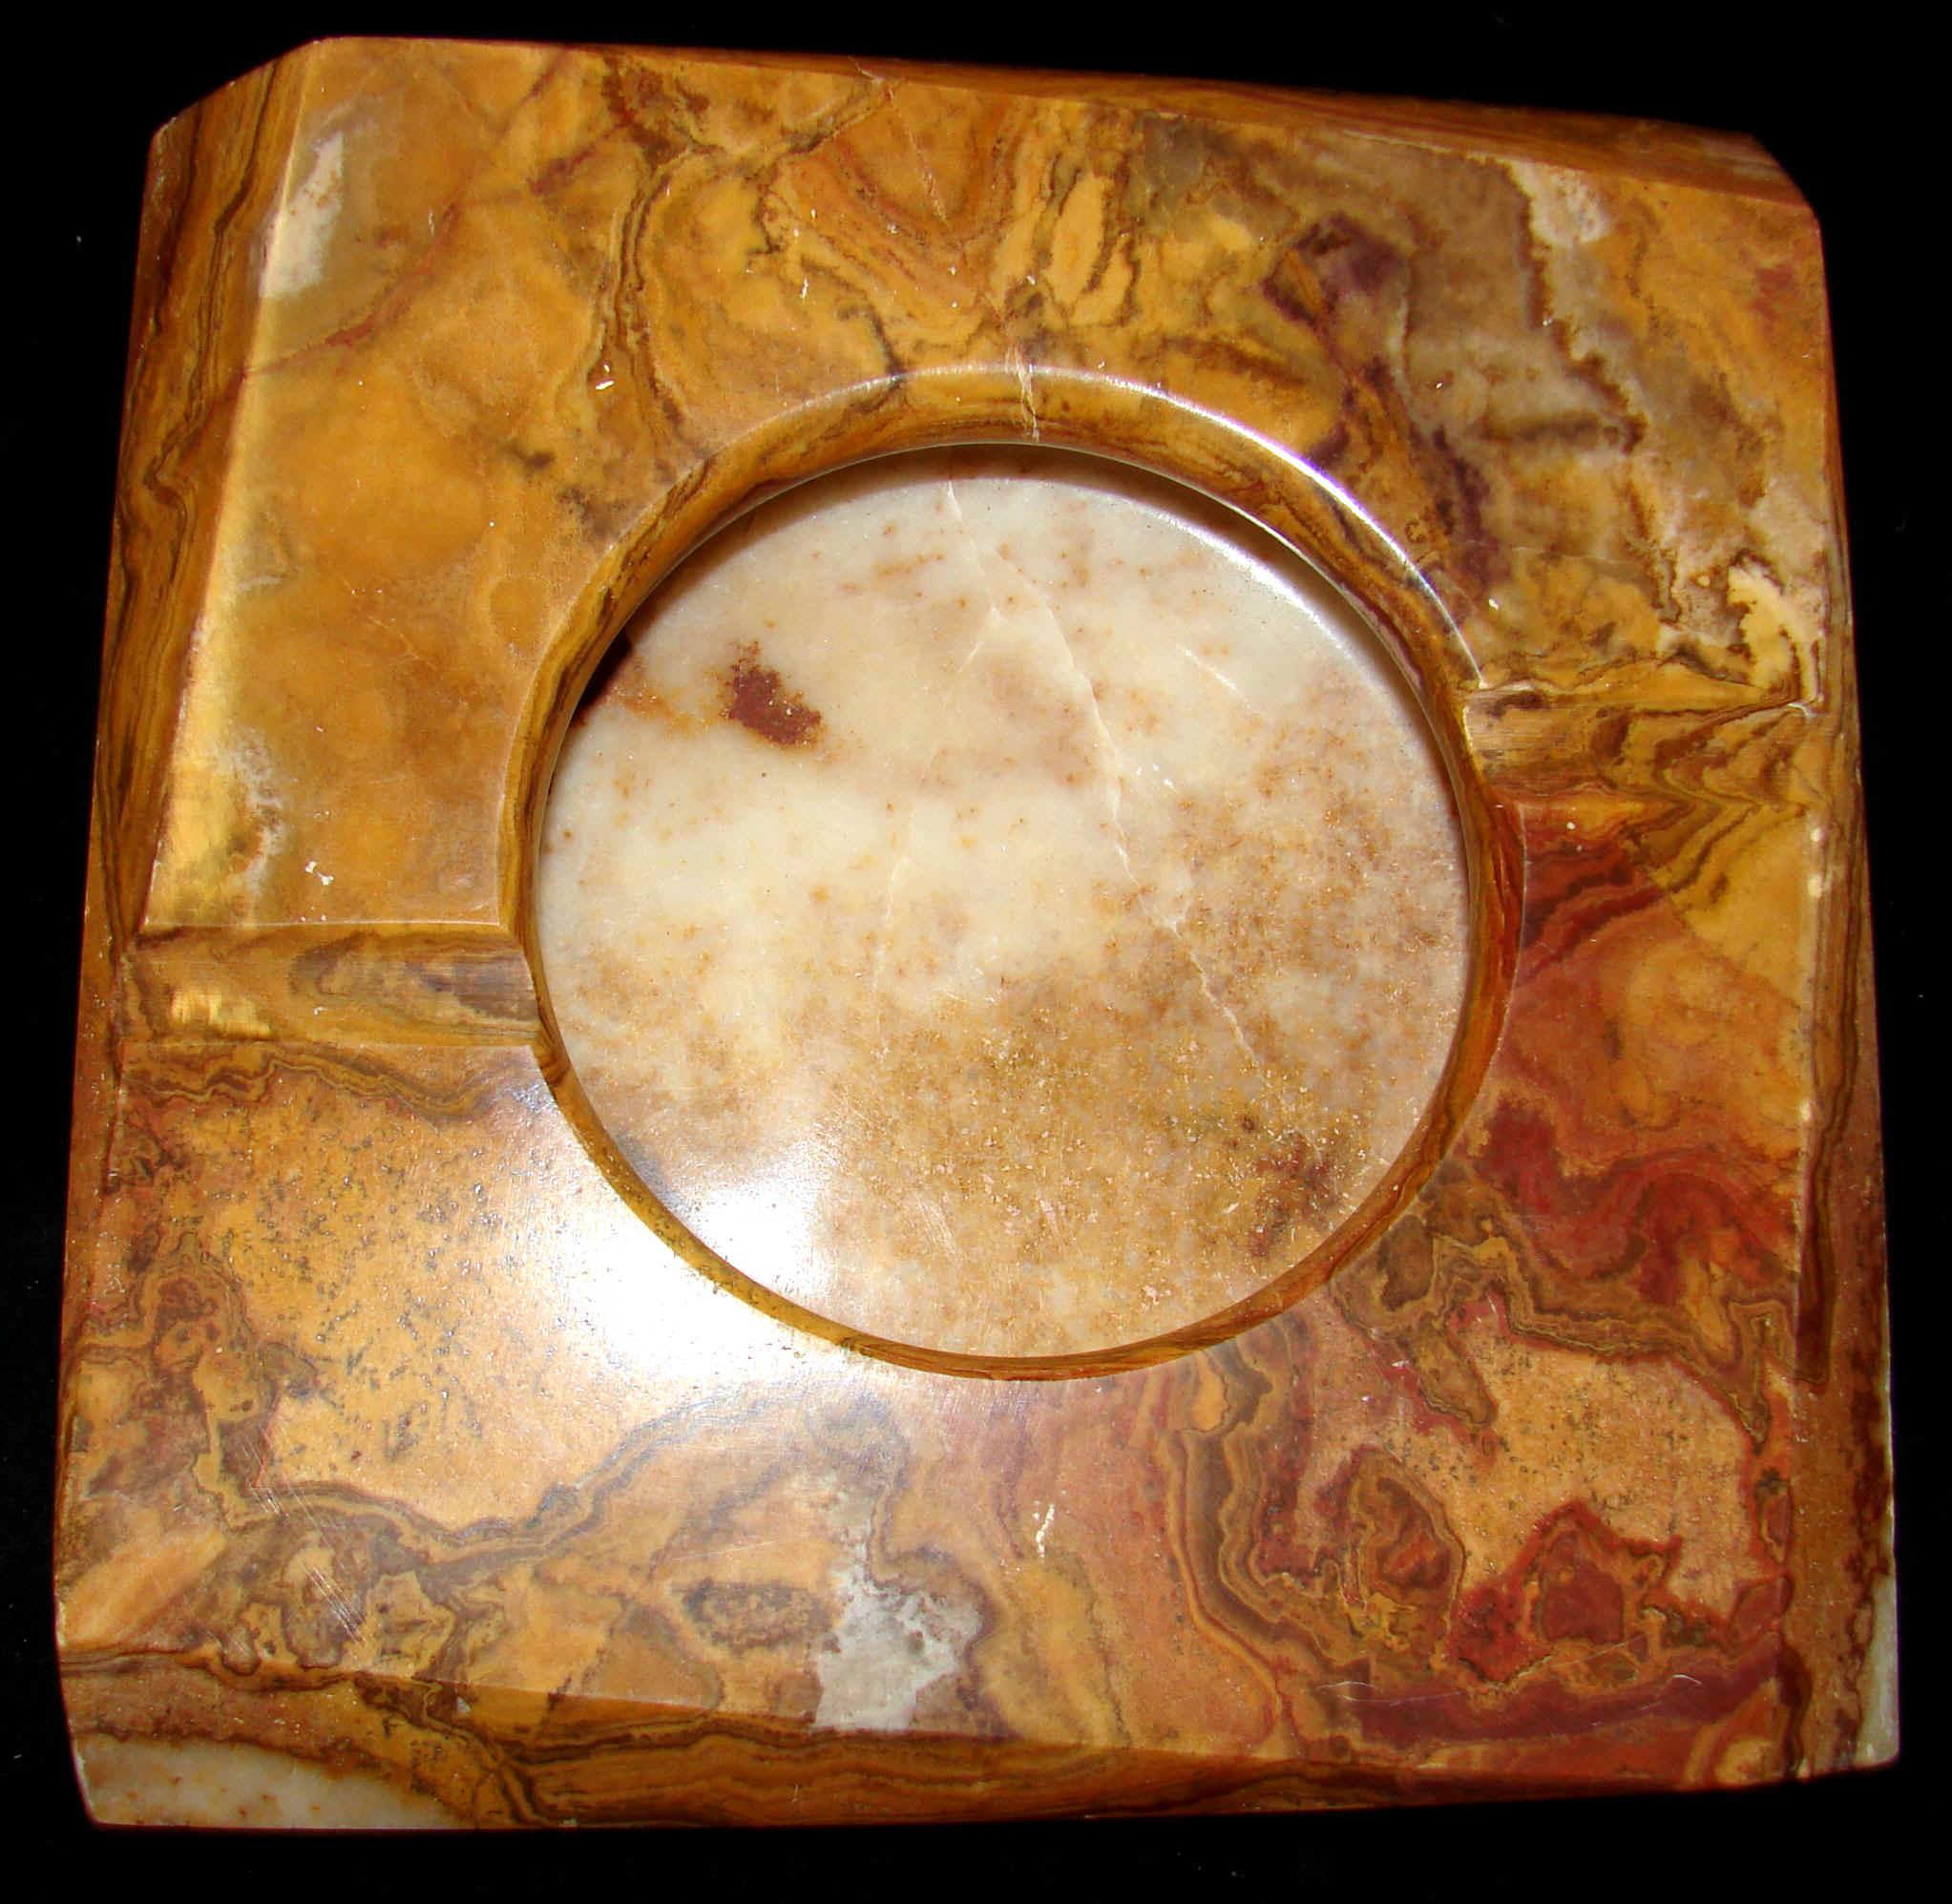 http://www.quartzcrystals.net/ashtray-square-7-7.jpg (582341 bytes)